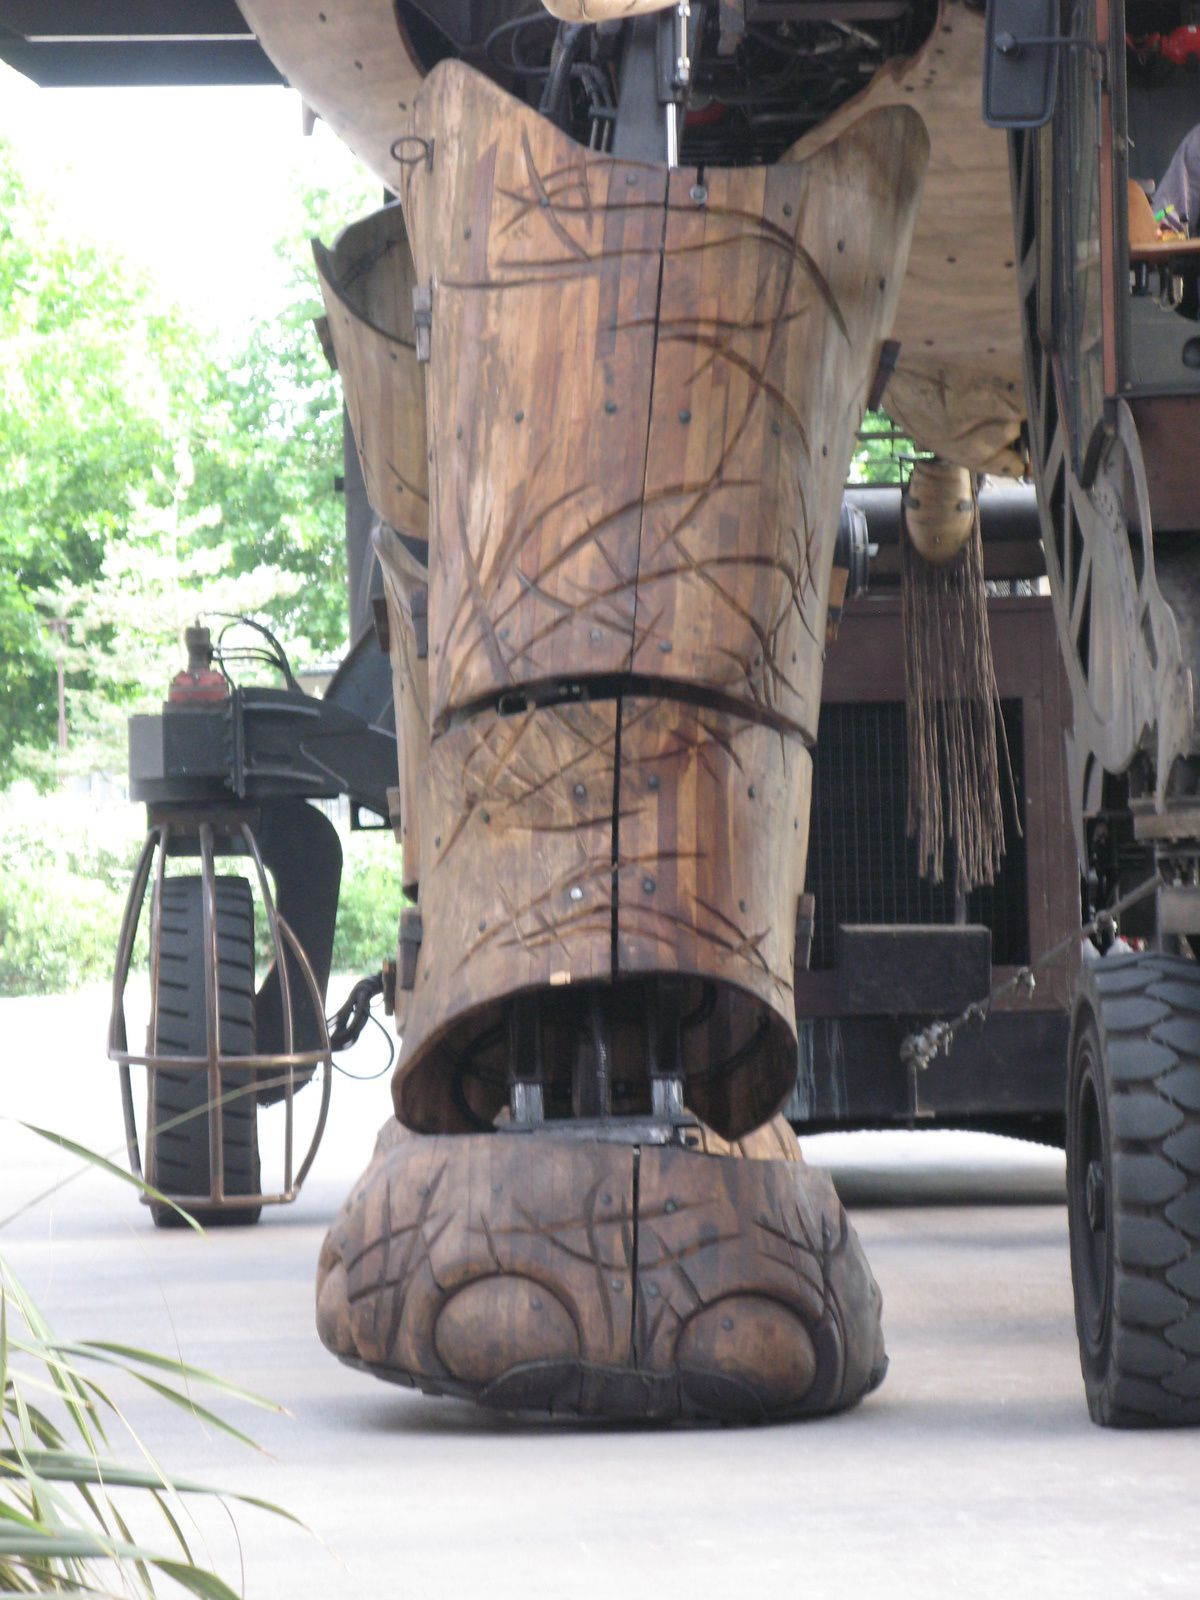 elephant de nantes - art de la rue sur charlotteblabla blog*